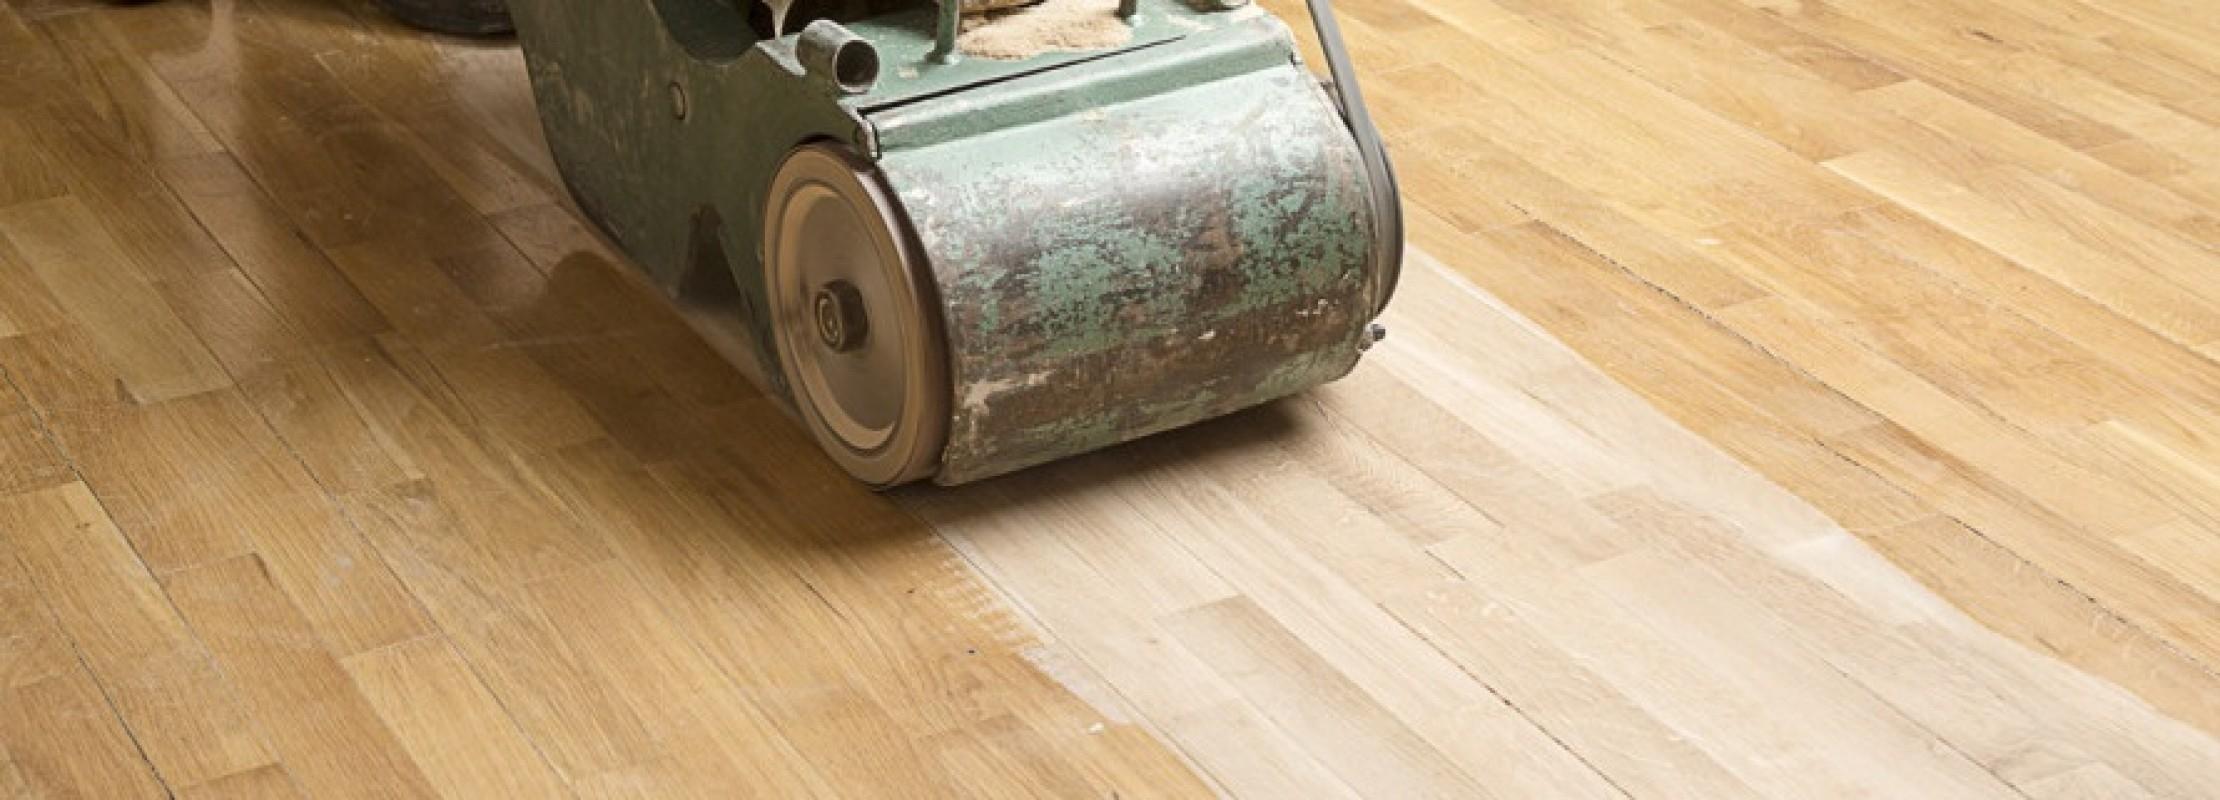 lucidatura parquet pavimento